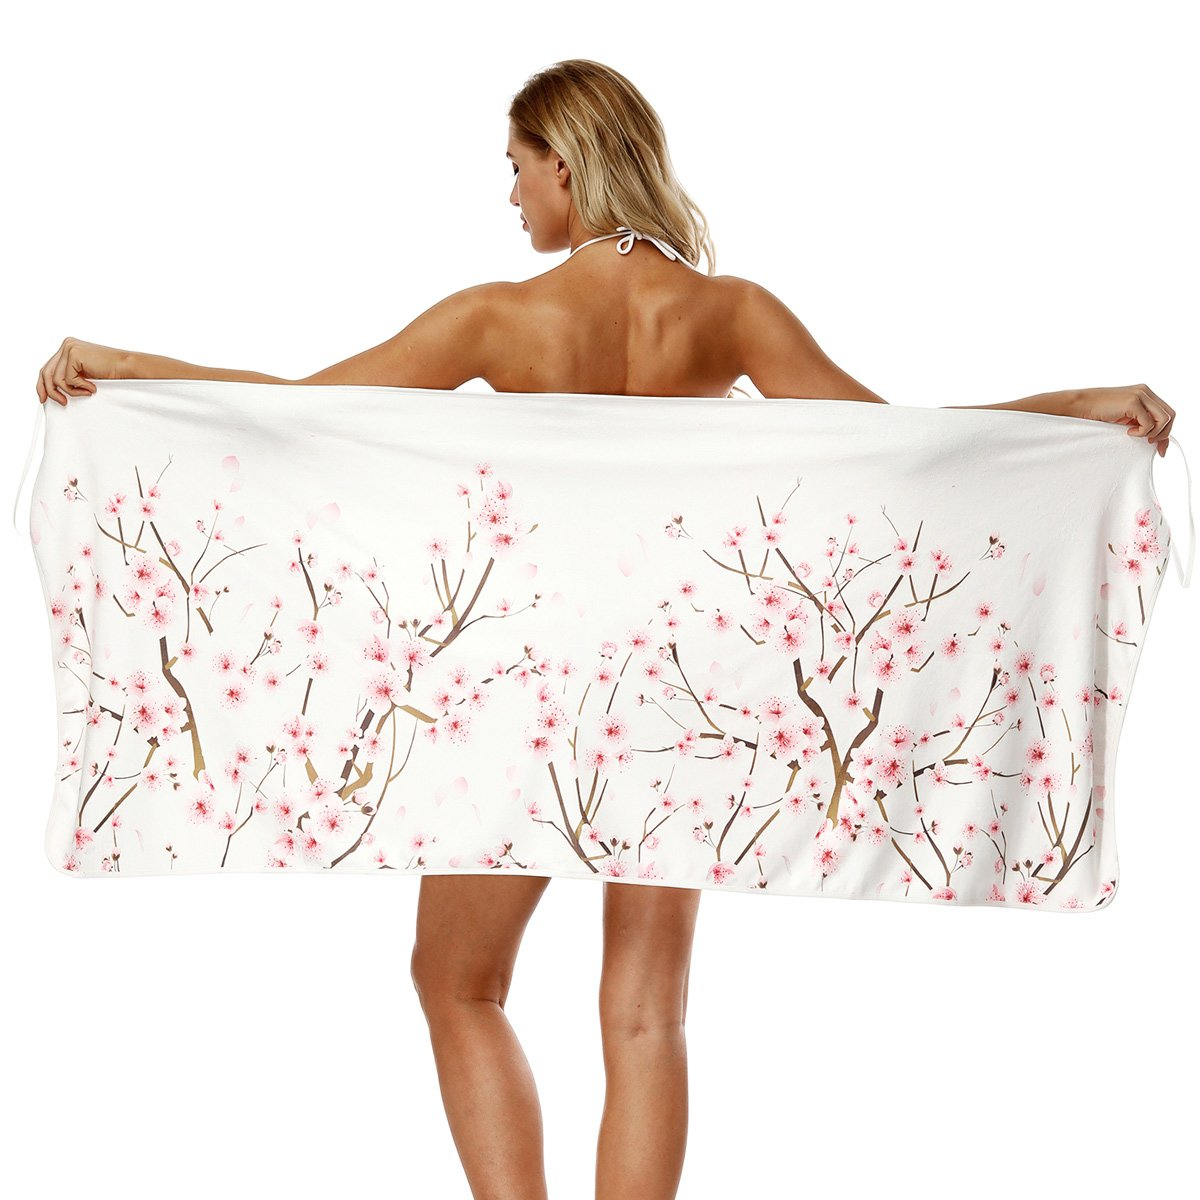 Women Beach Towel Holiday Cover-Ups Sarongs Girls Digital Printing Bikini Swimwear Strap Bath Towel (Watermelon) Crazy lin